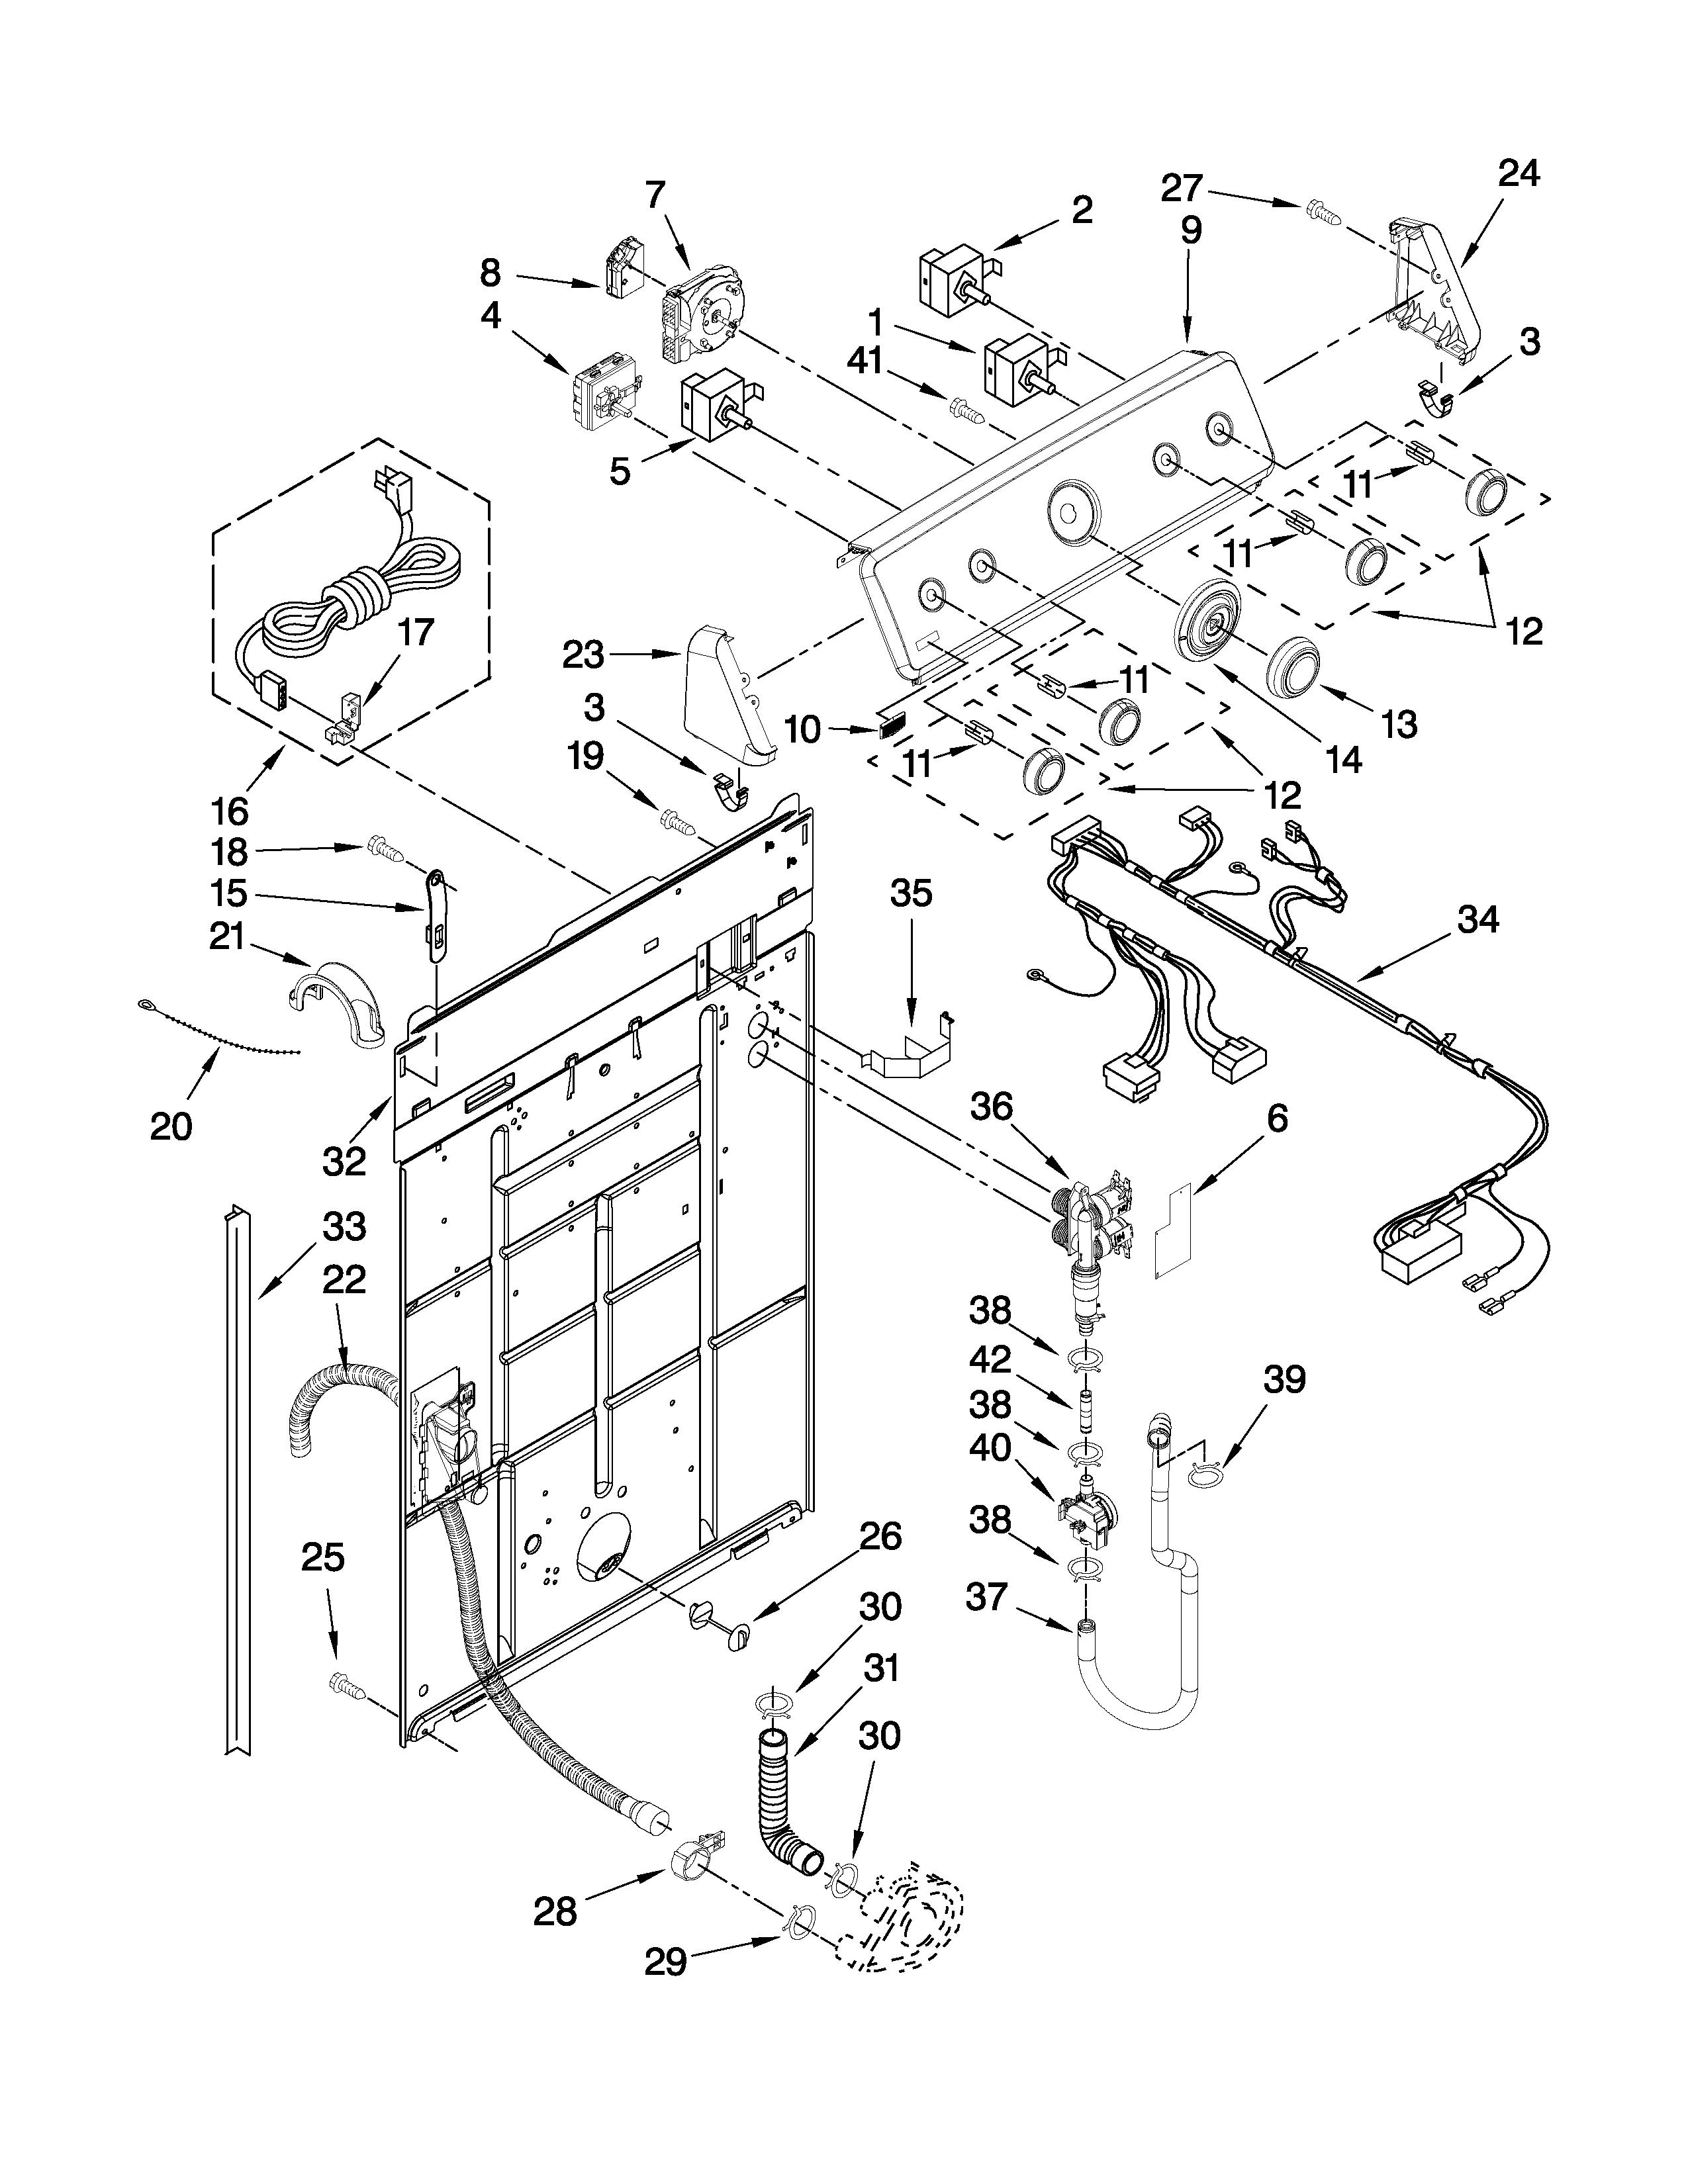 maytag washer wiring diagram wiring diagram